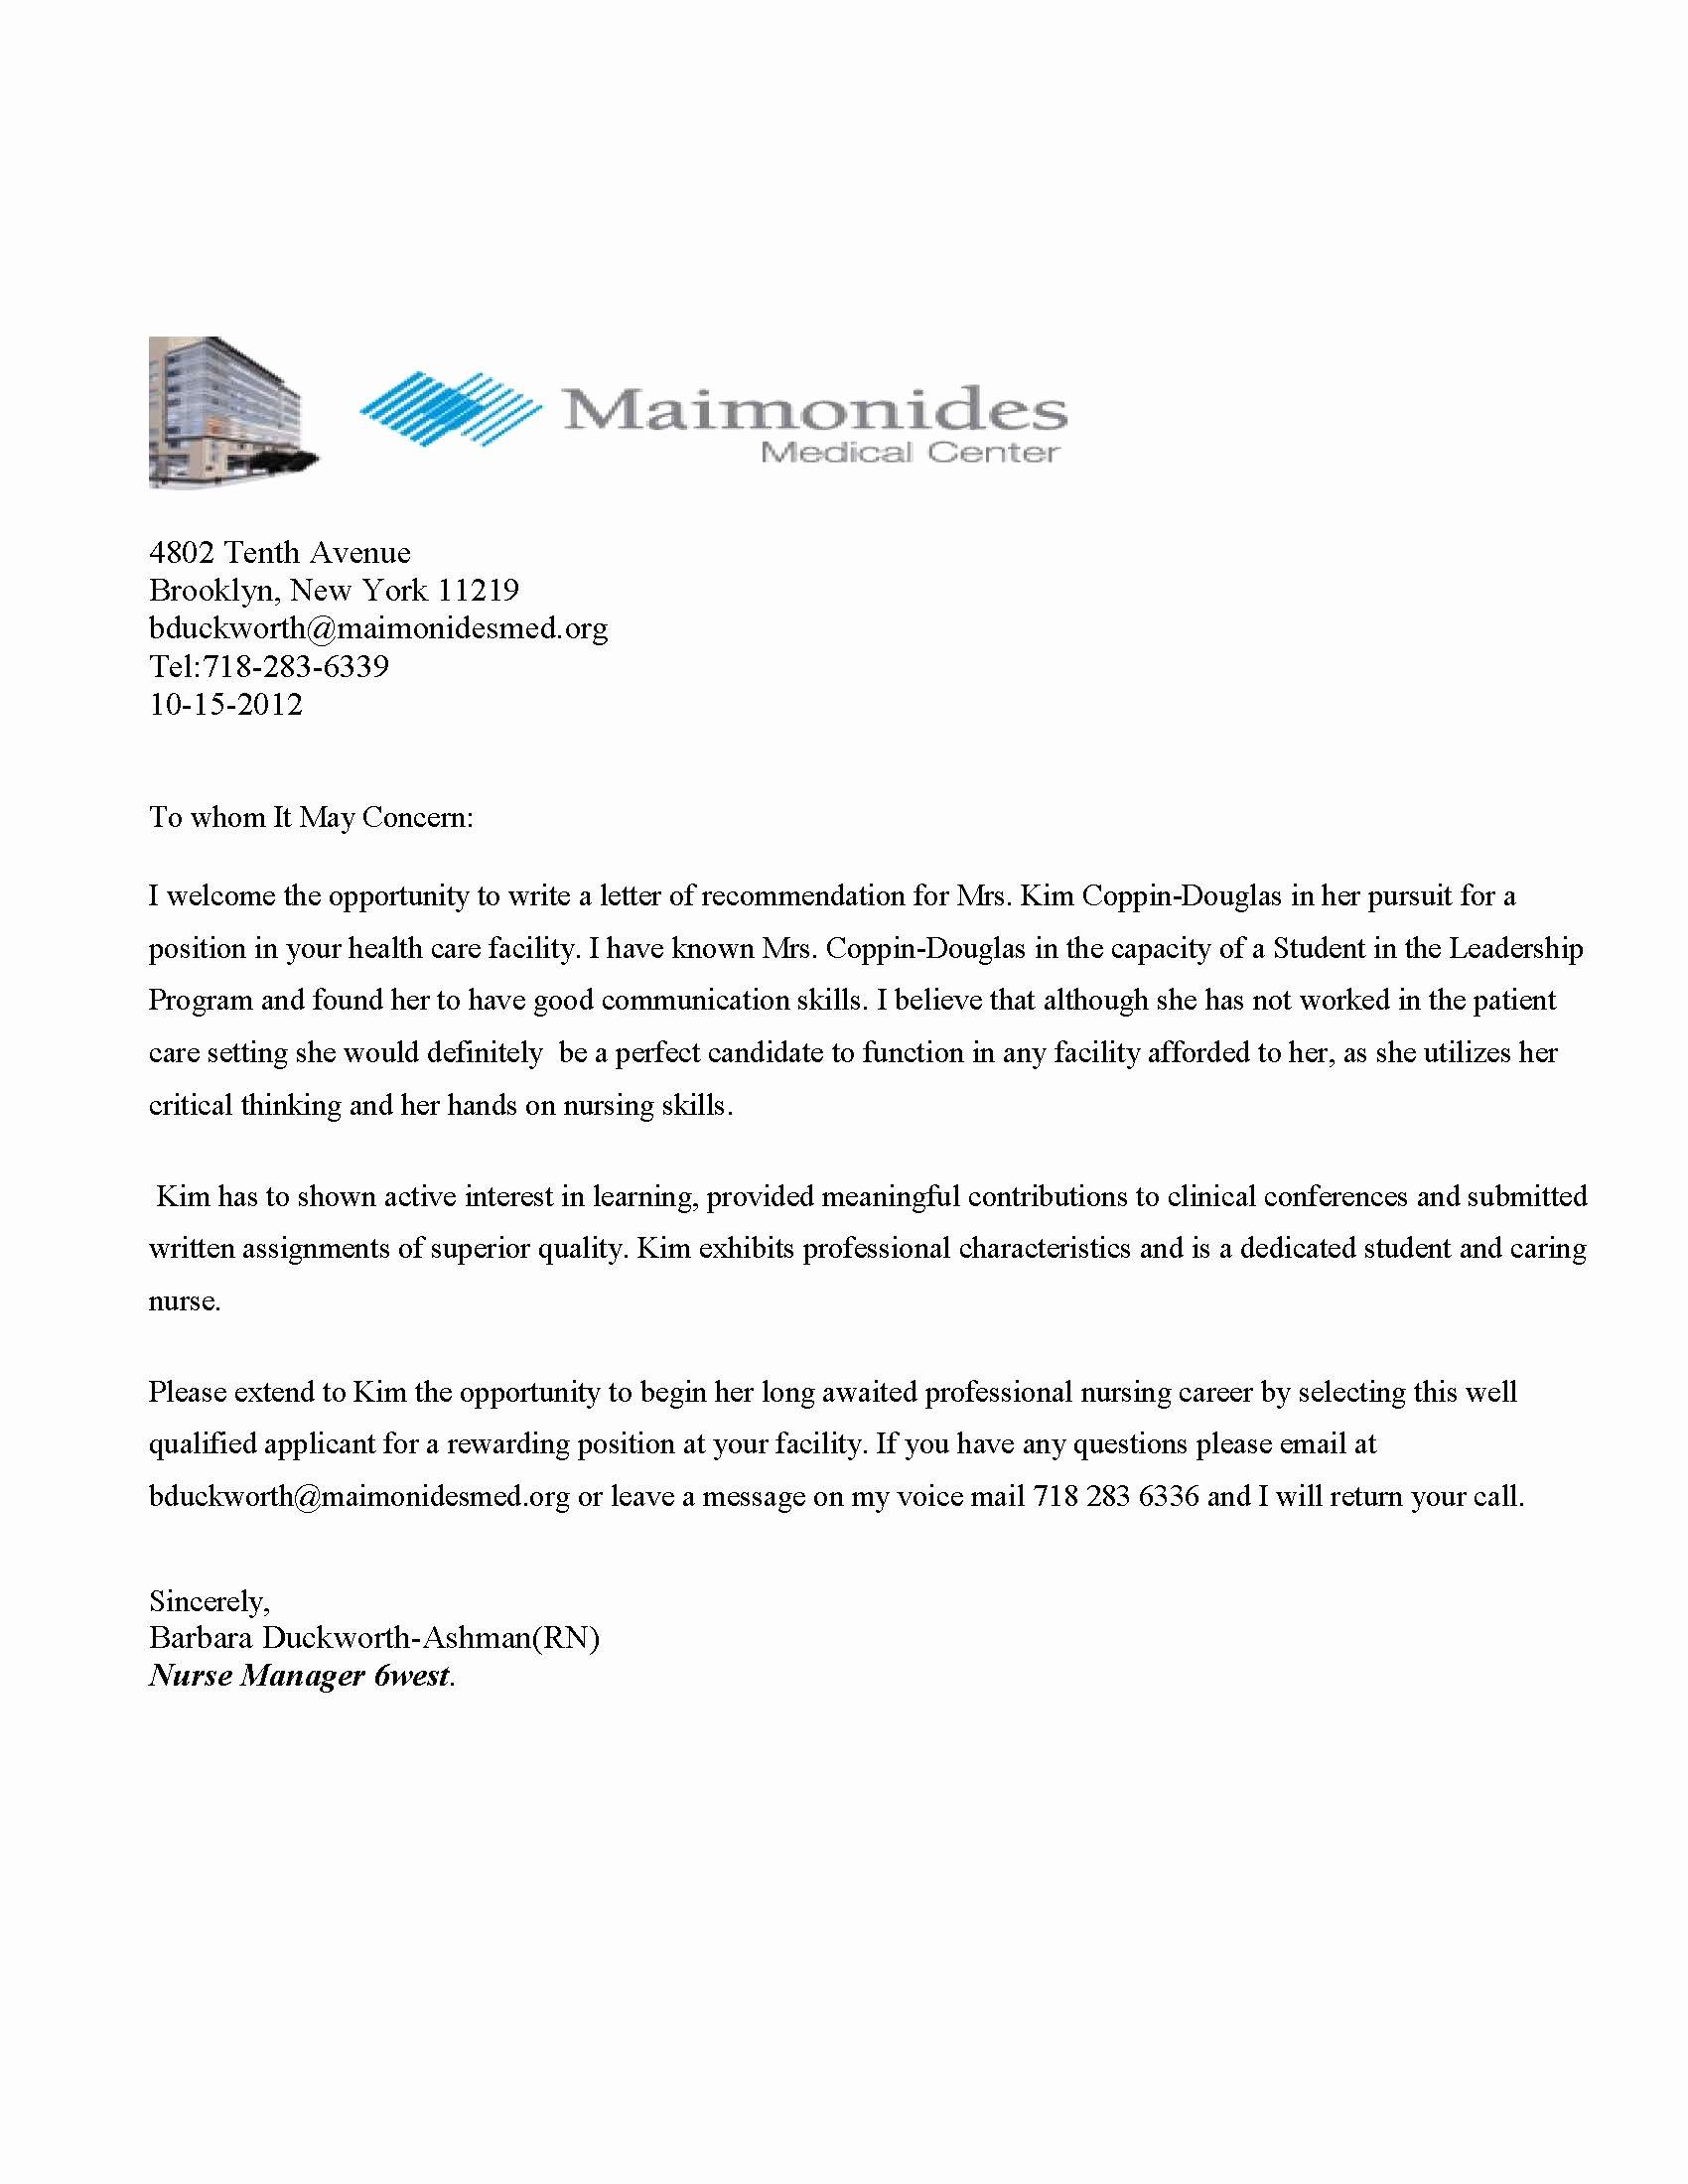 Letter Of Recommendation Medical School Best Of Maimonides Medical Center